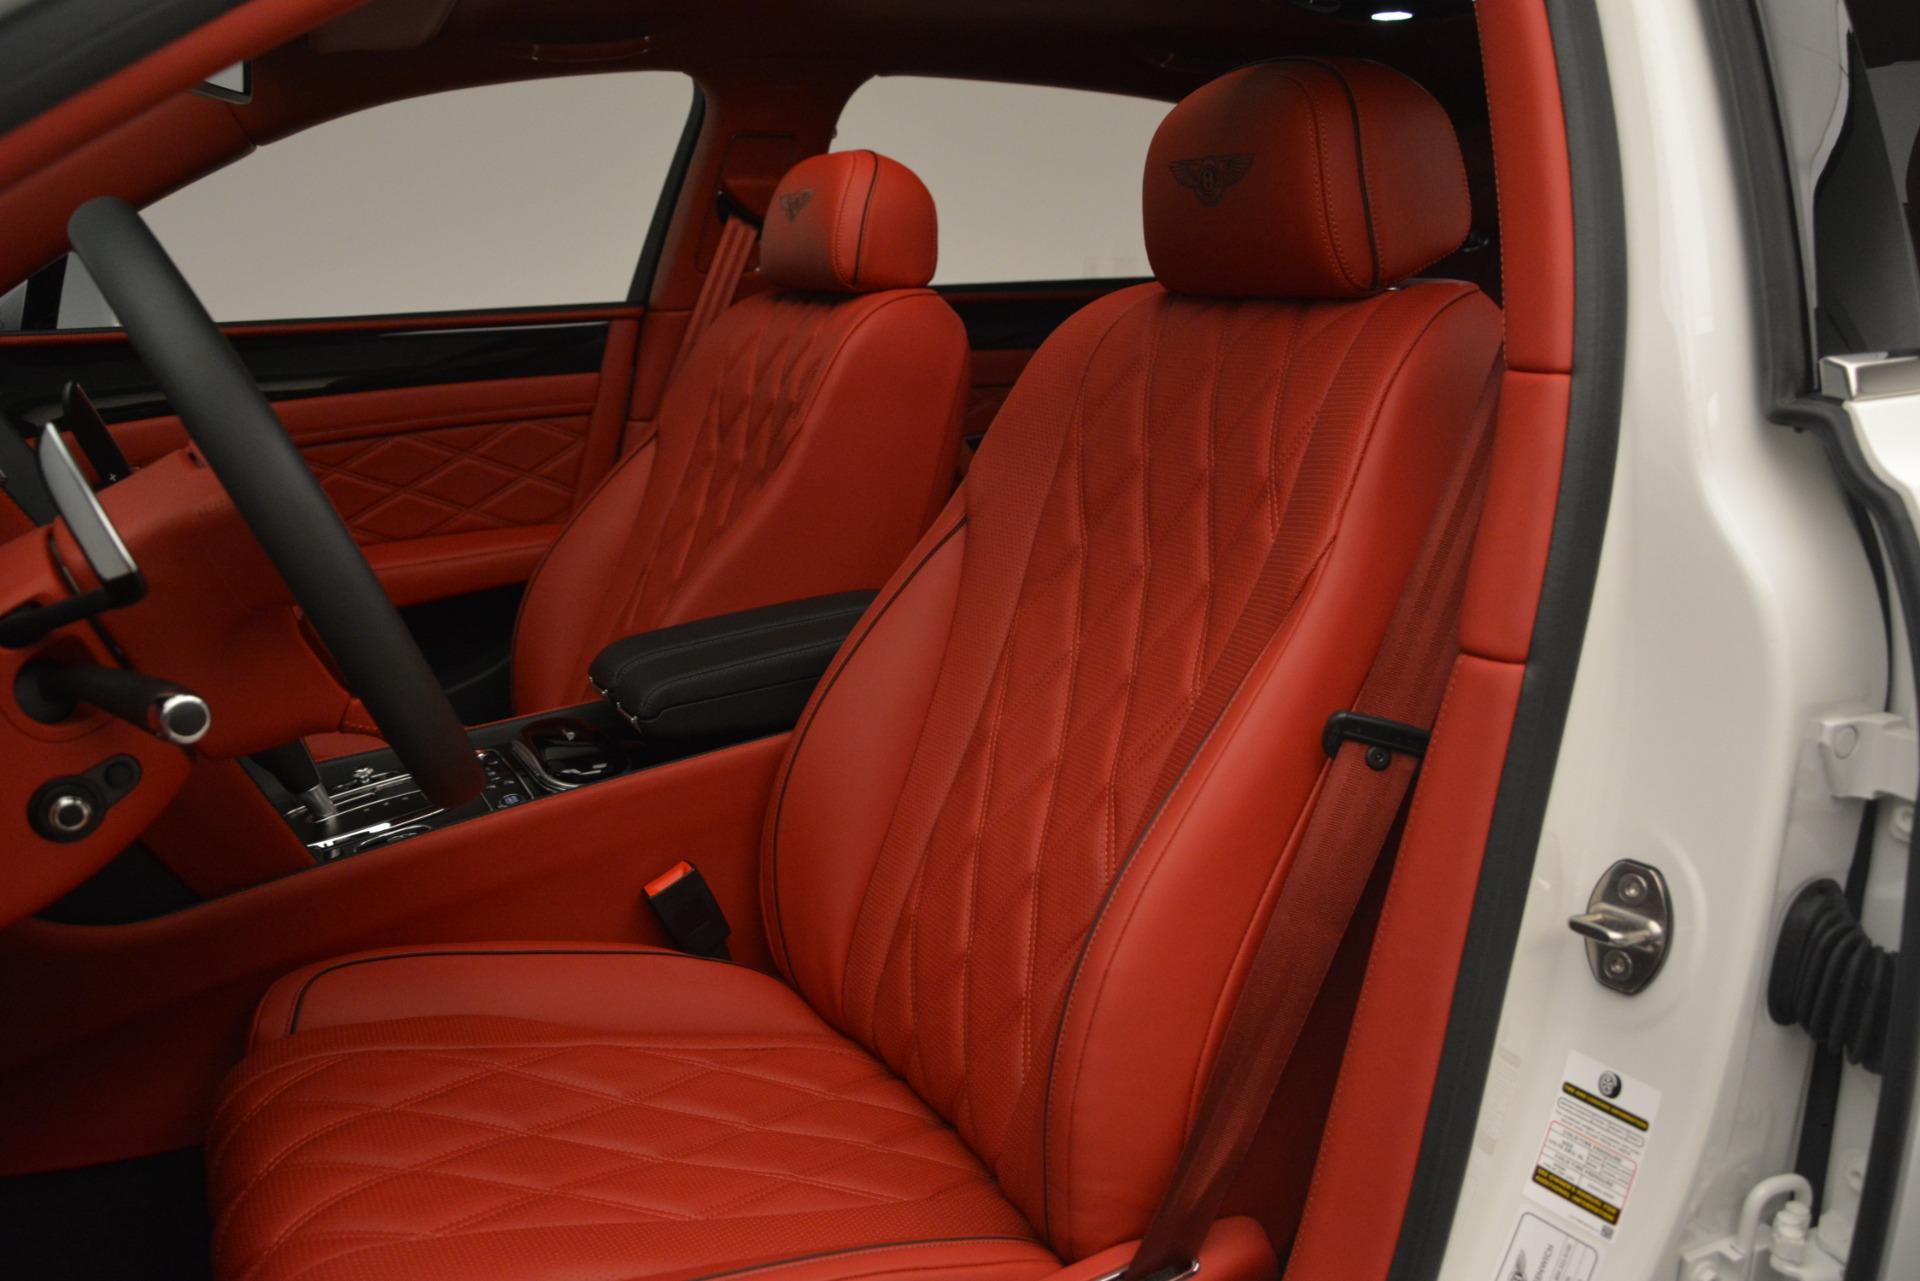 Used 2016 Bentley Flying Spur V8 For Sale In Westport, CT 3265_p20